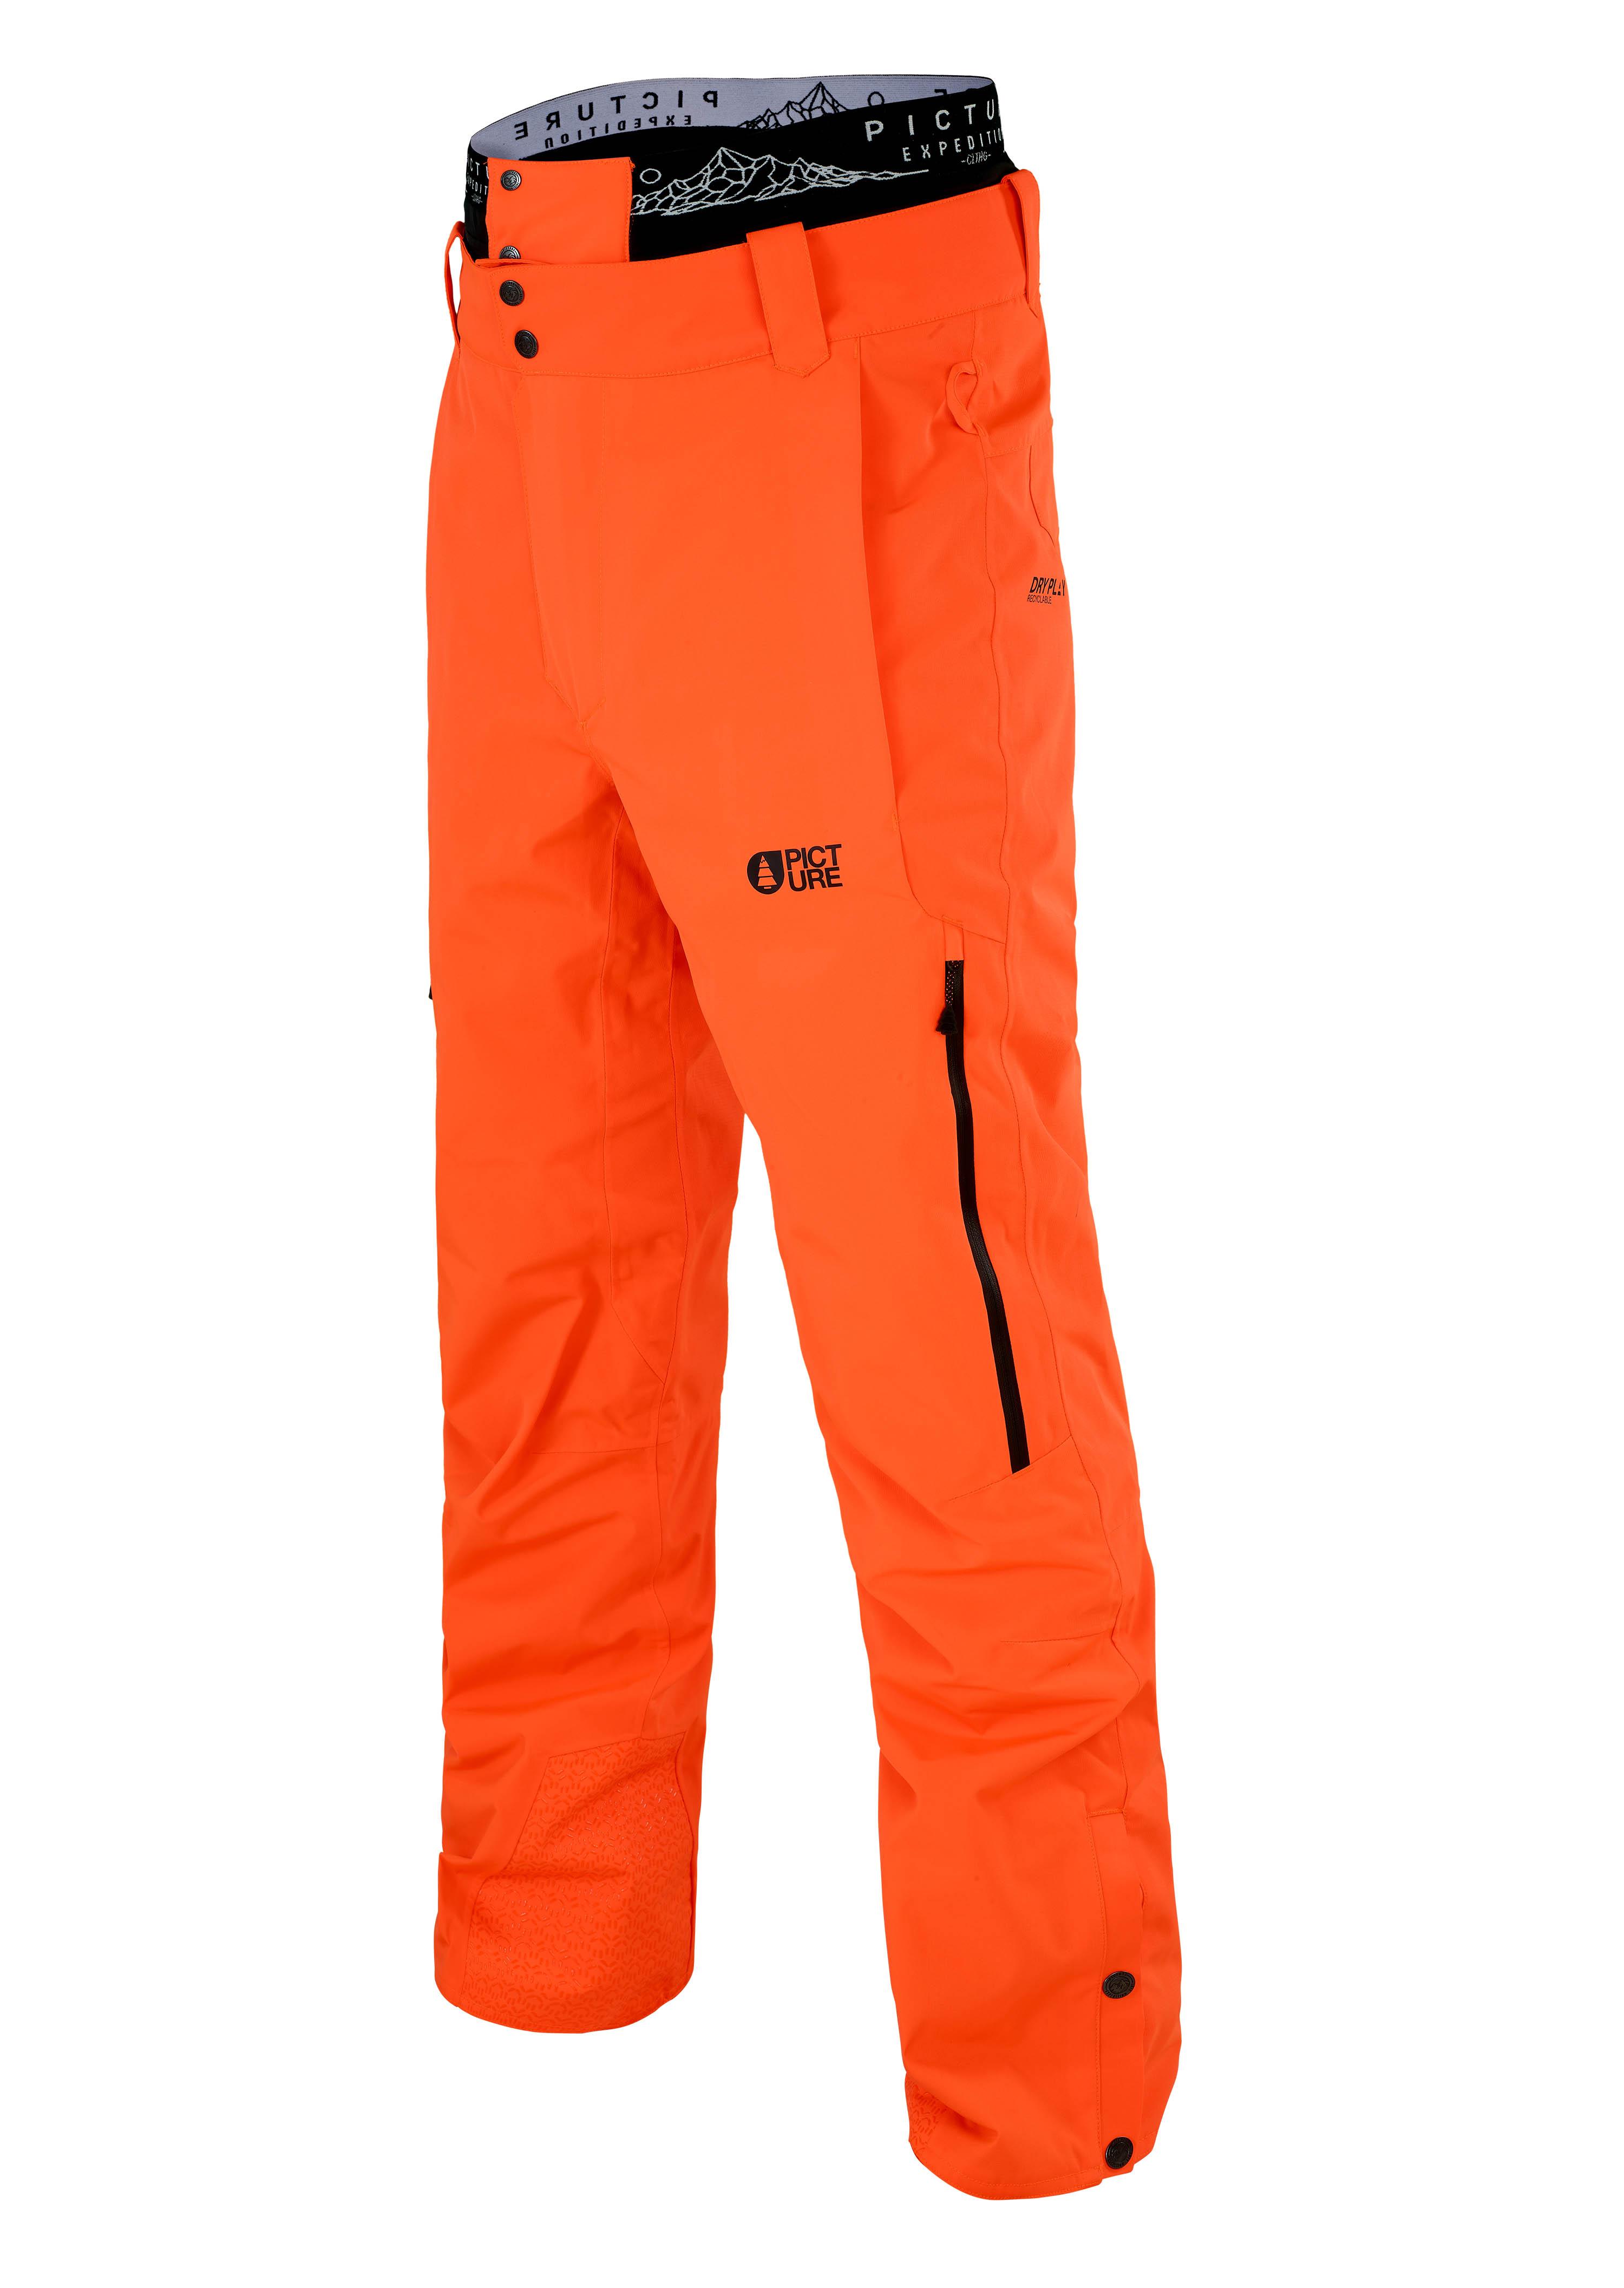 Orange Picture Orange Picture Object Ski Object Pantalon Pantalon Ski jUVSqzpLMG